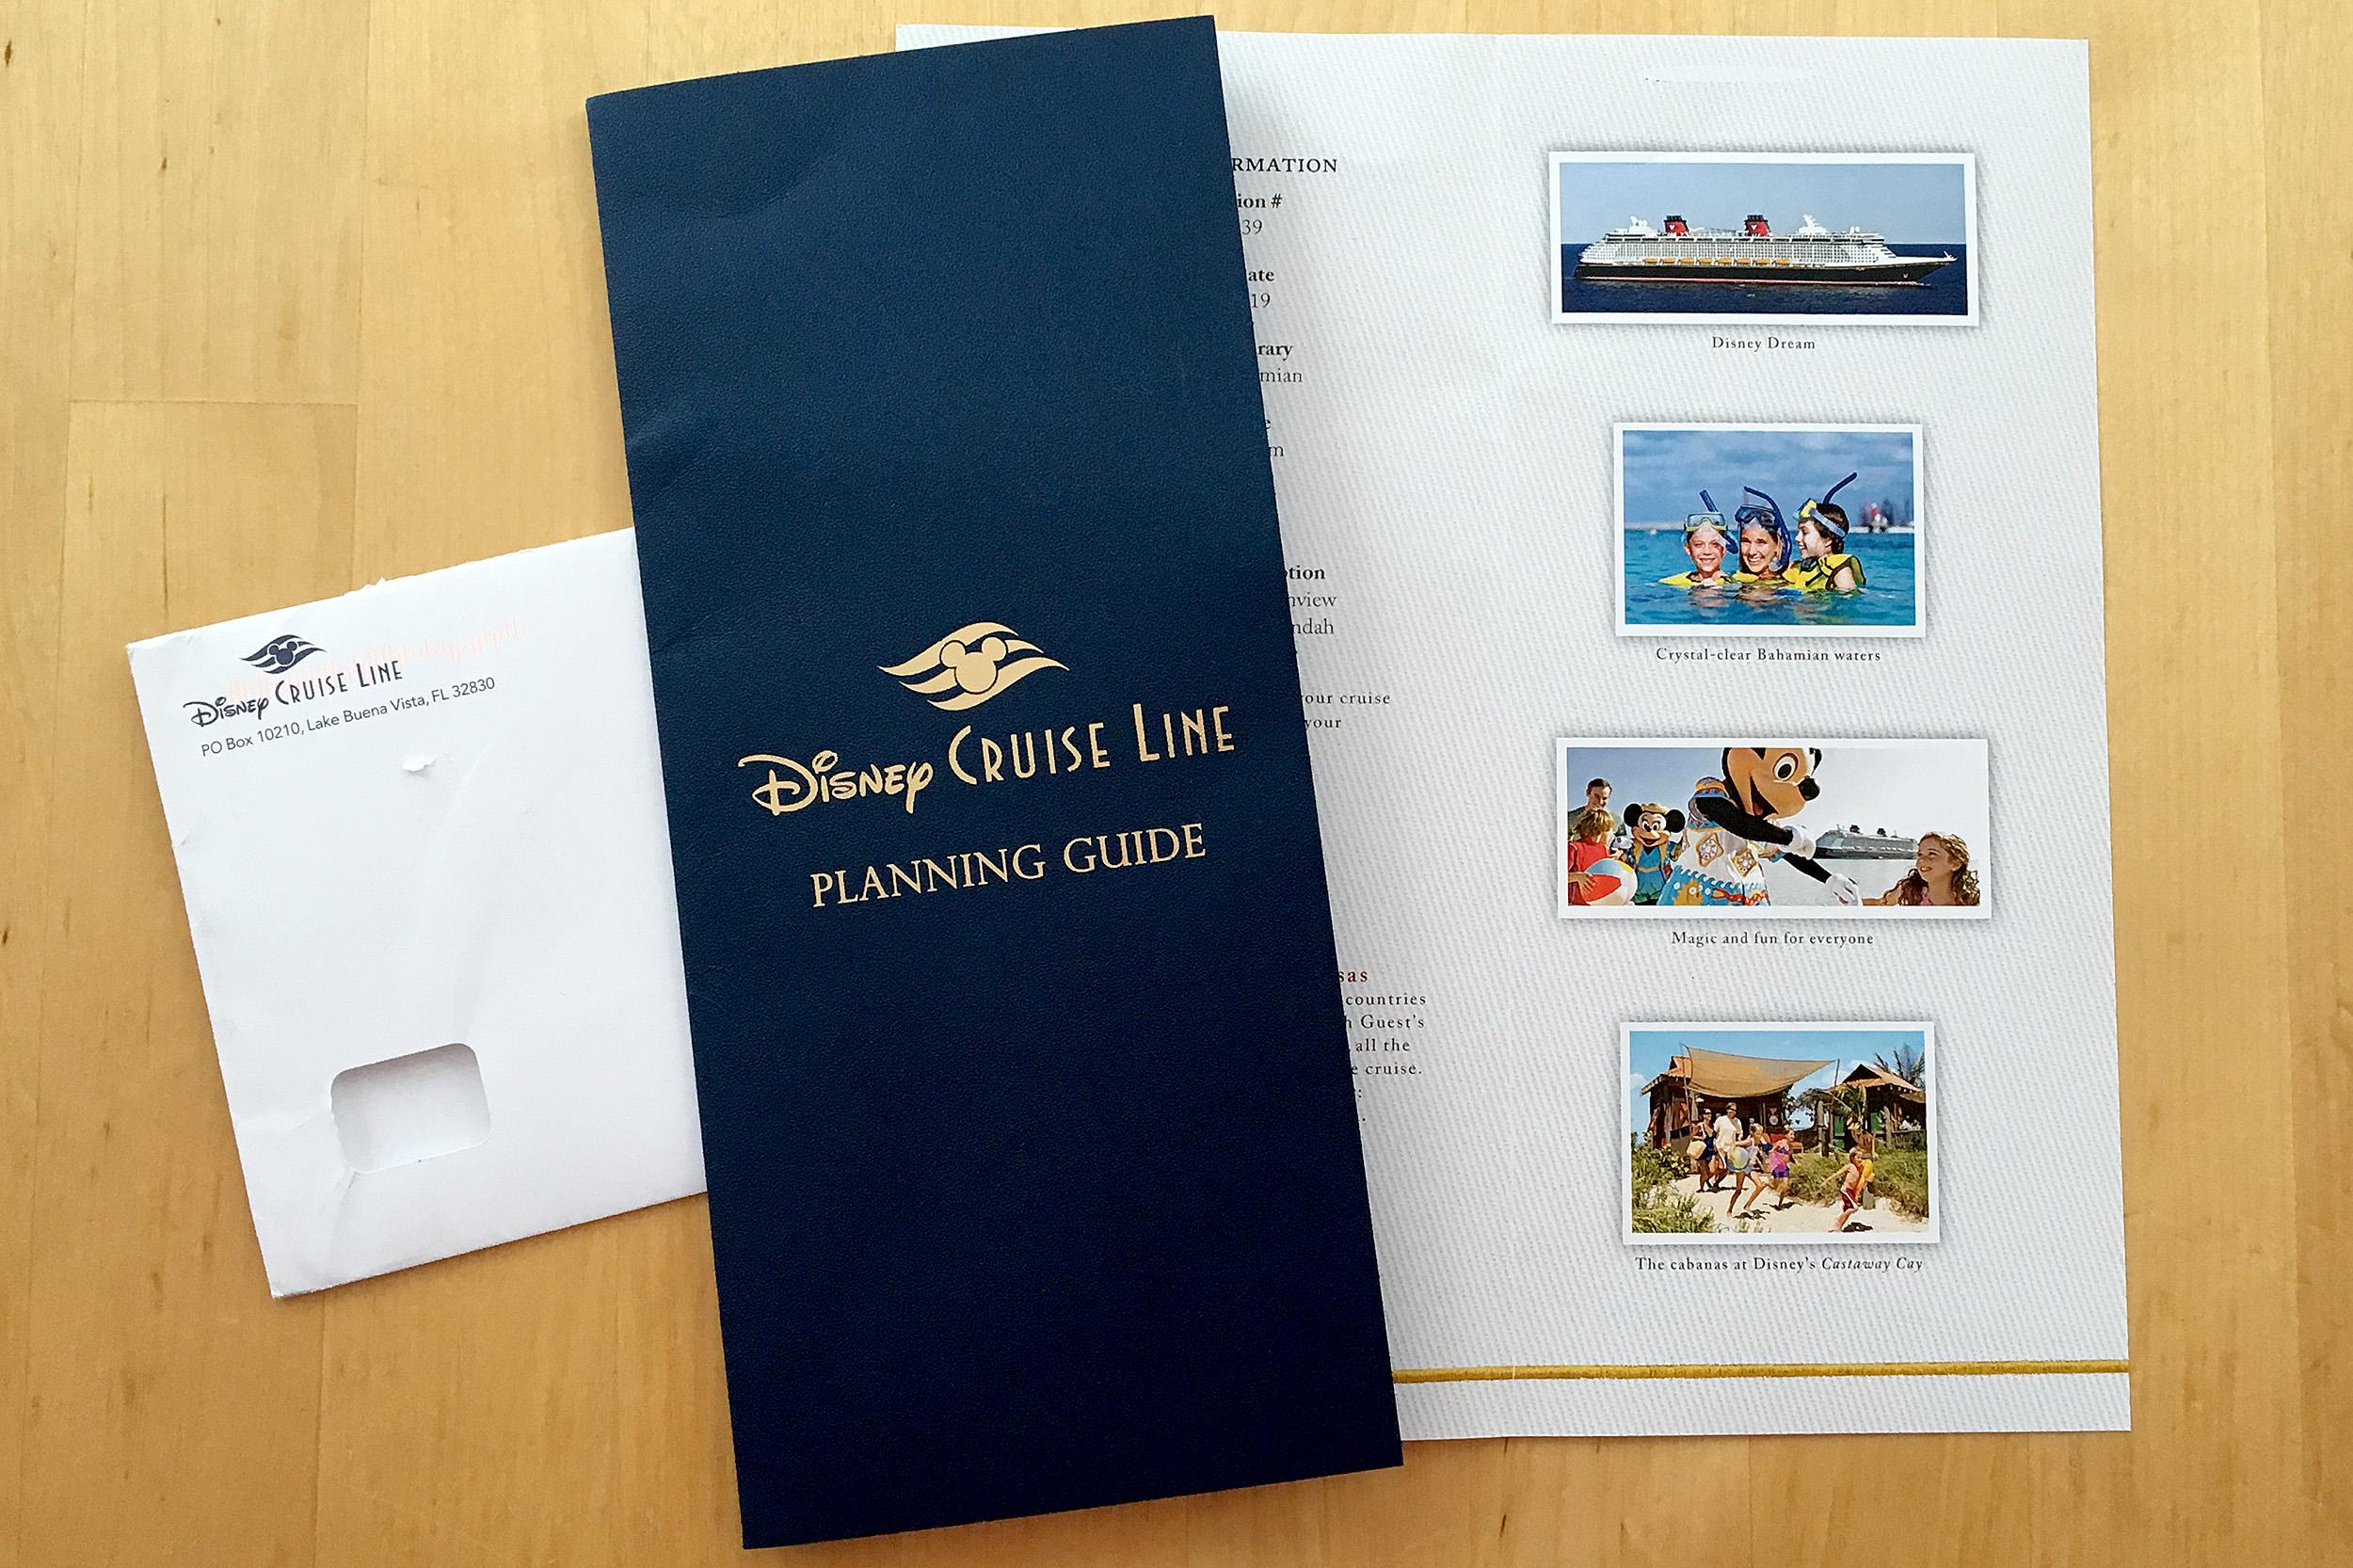 Disneykryssning Planeringsguide